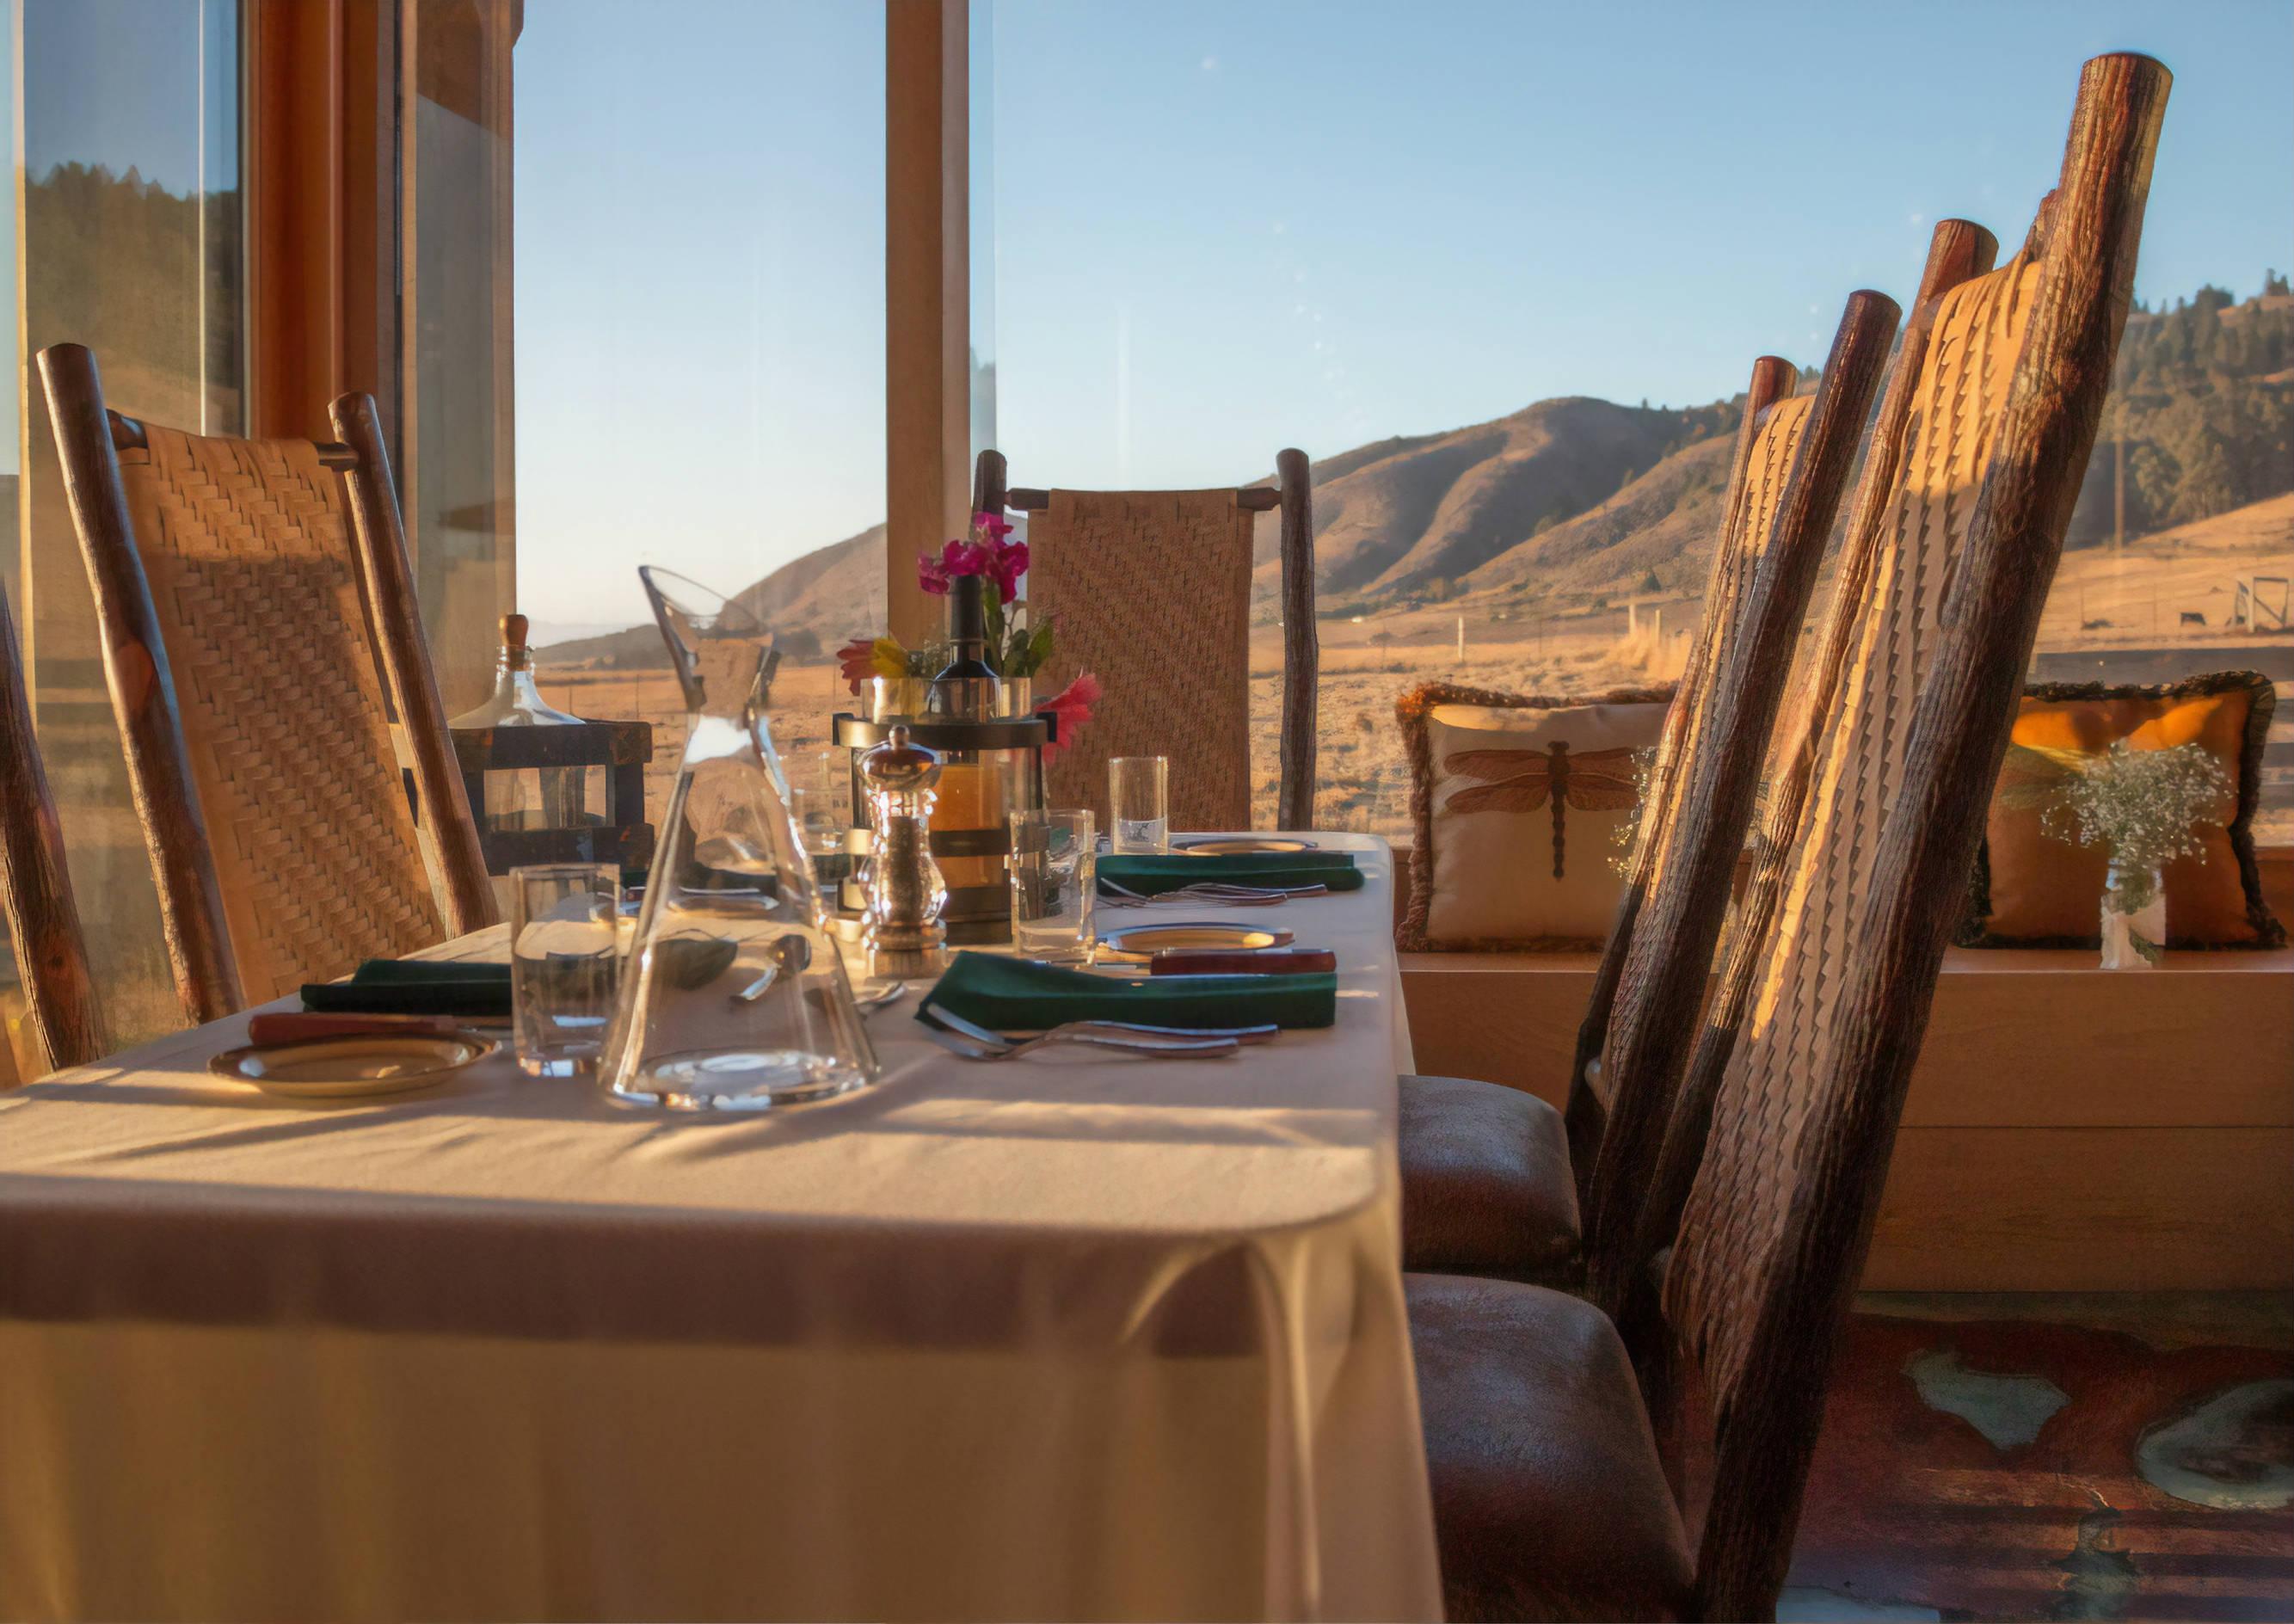 Dinner Table The Inn at Newport Ranch